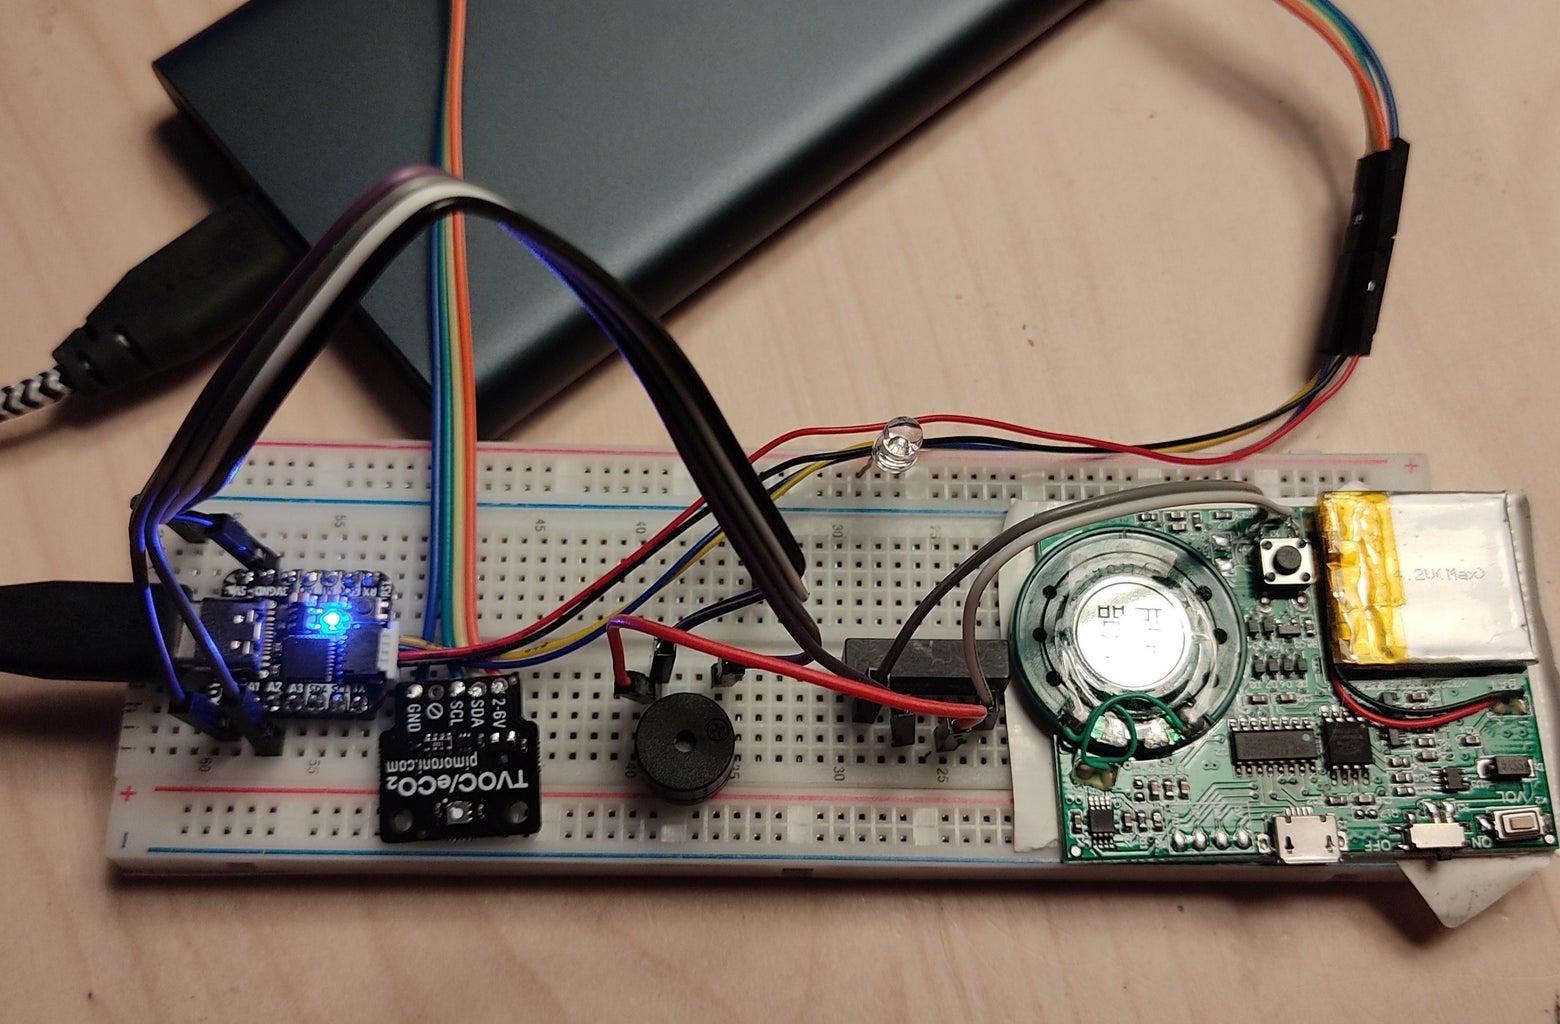 A Flatulence Detector Using the SGP30 Sensor